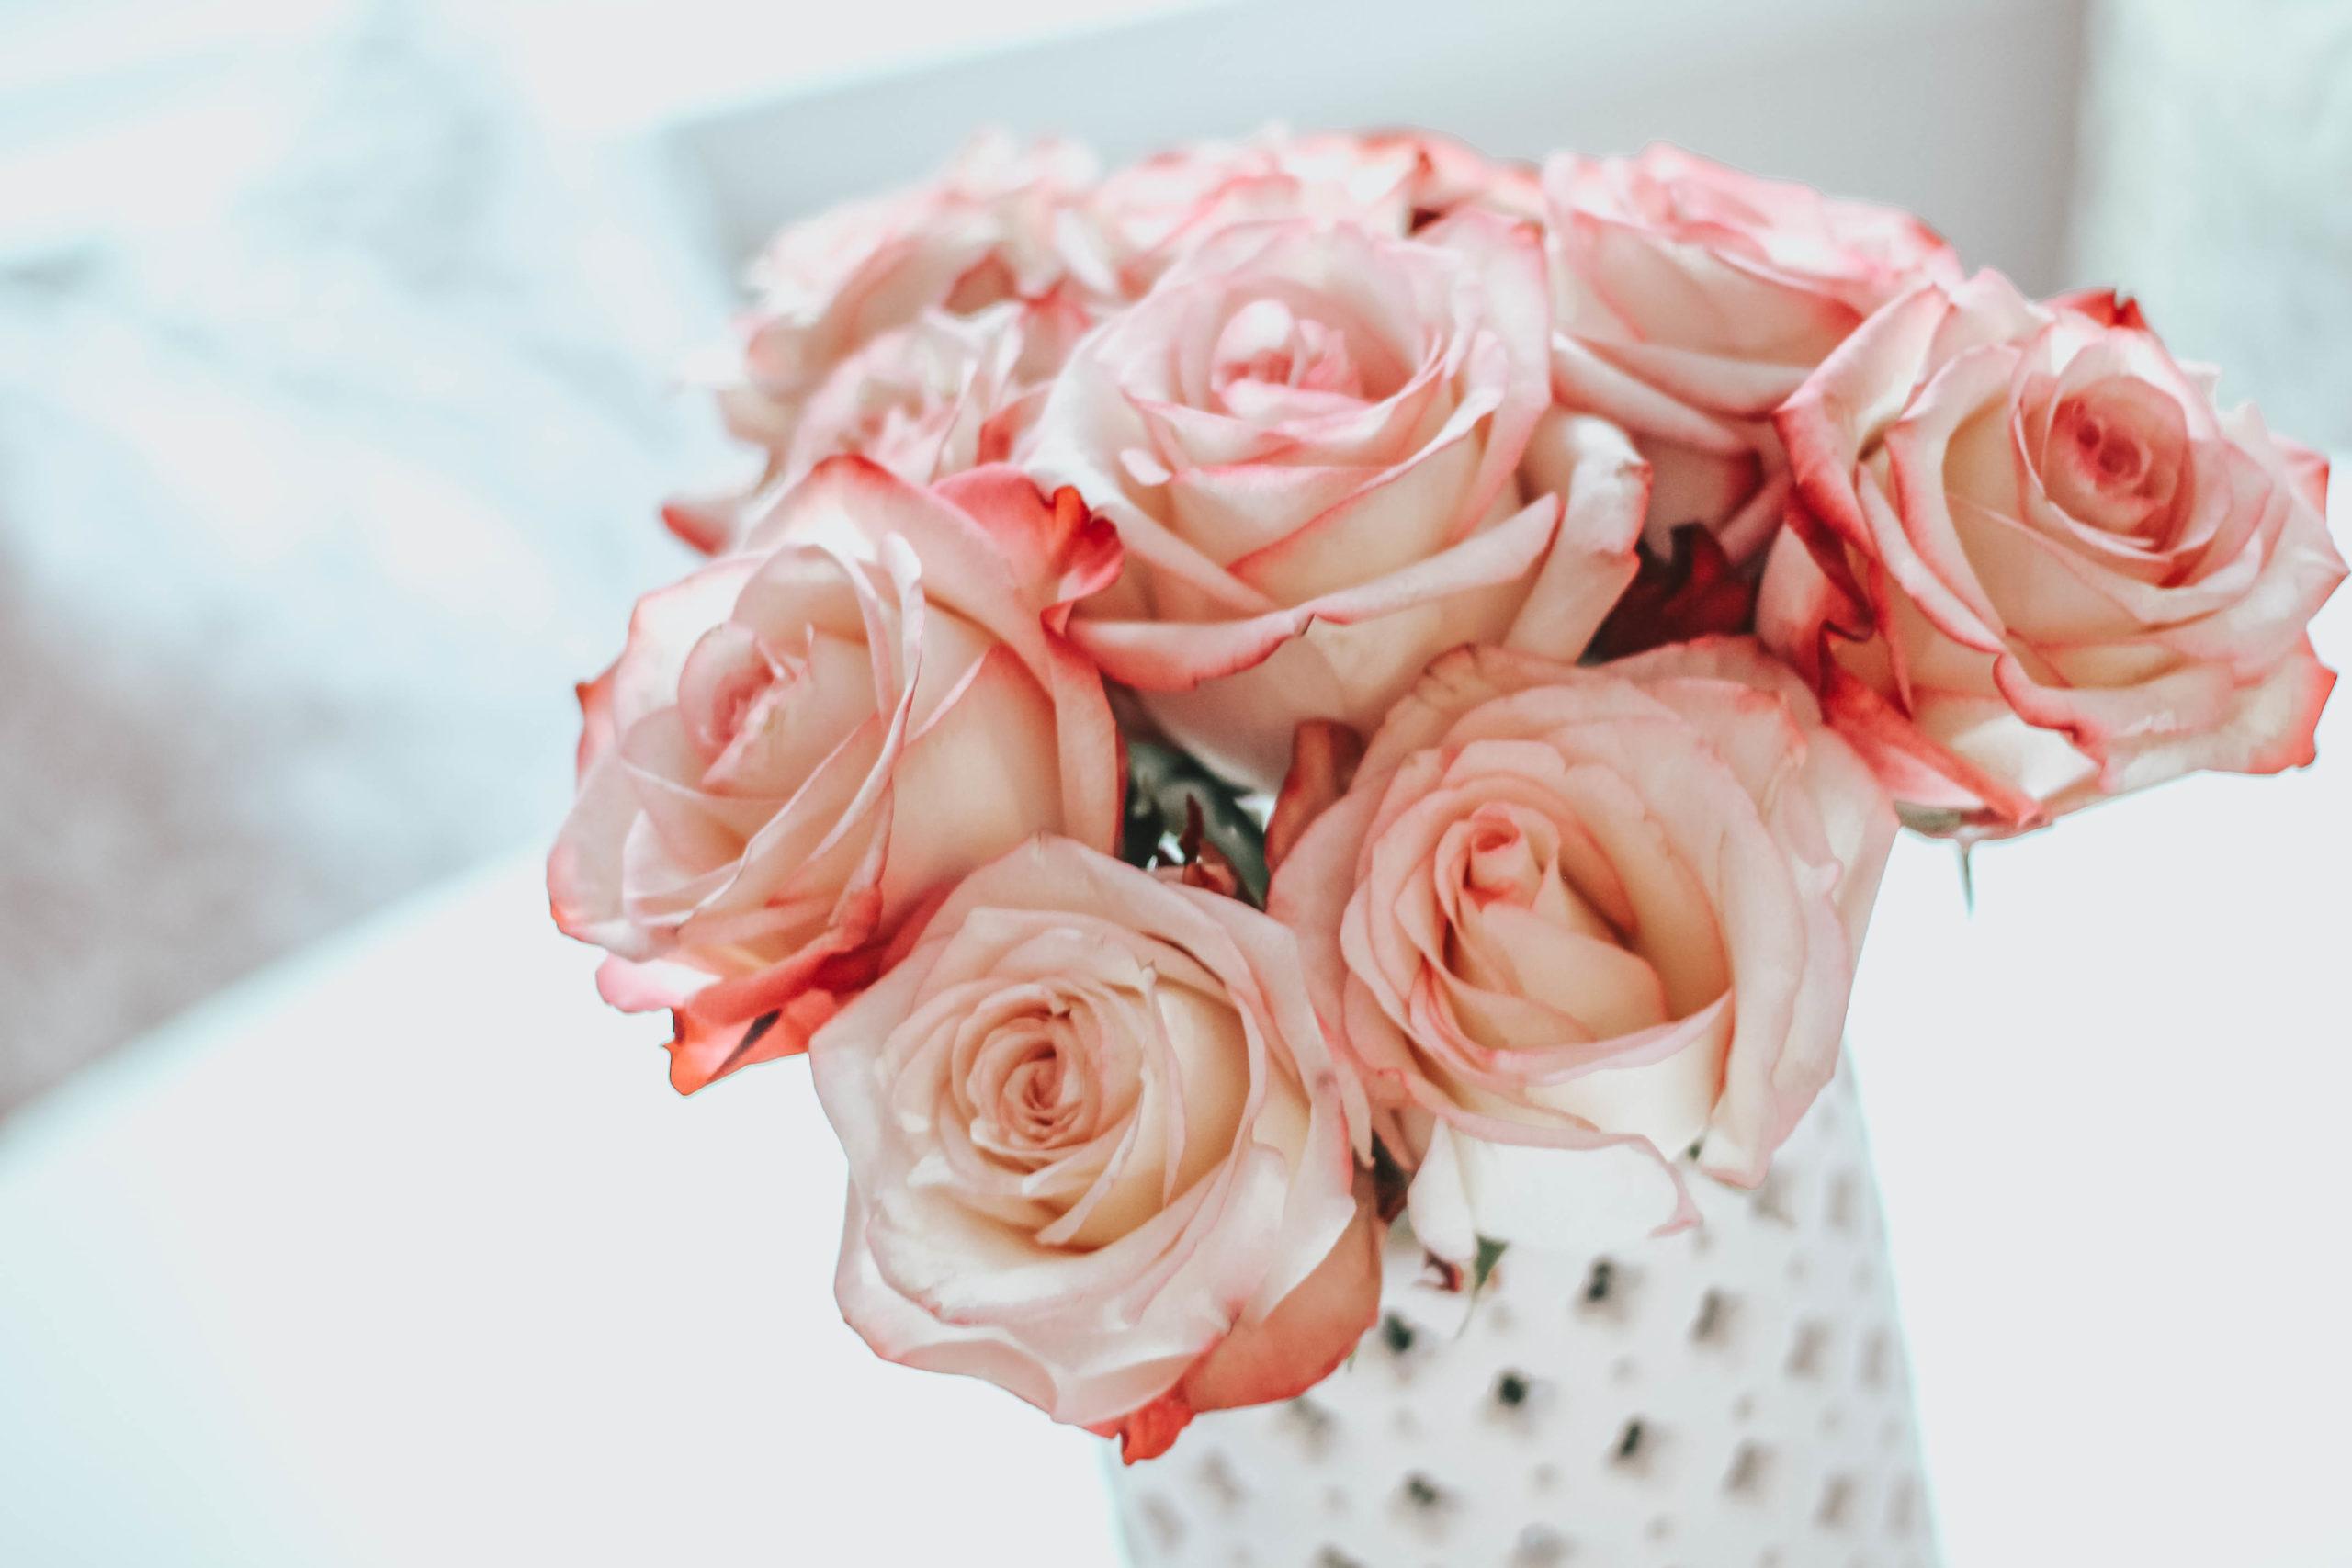 rose cutting tutorial